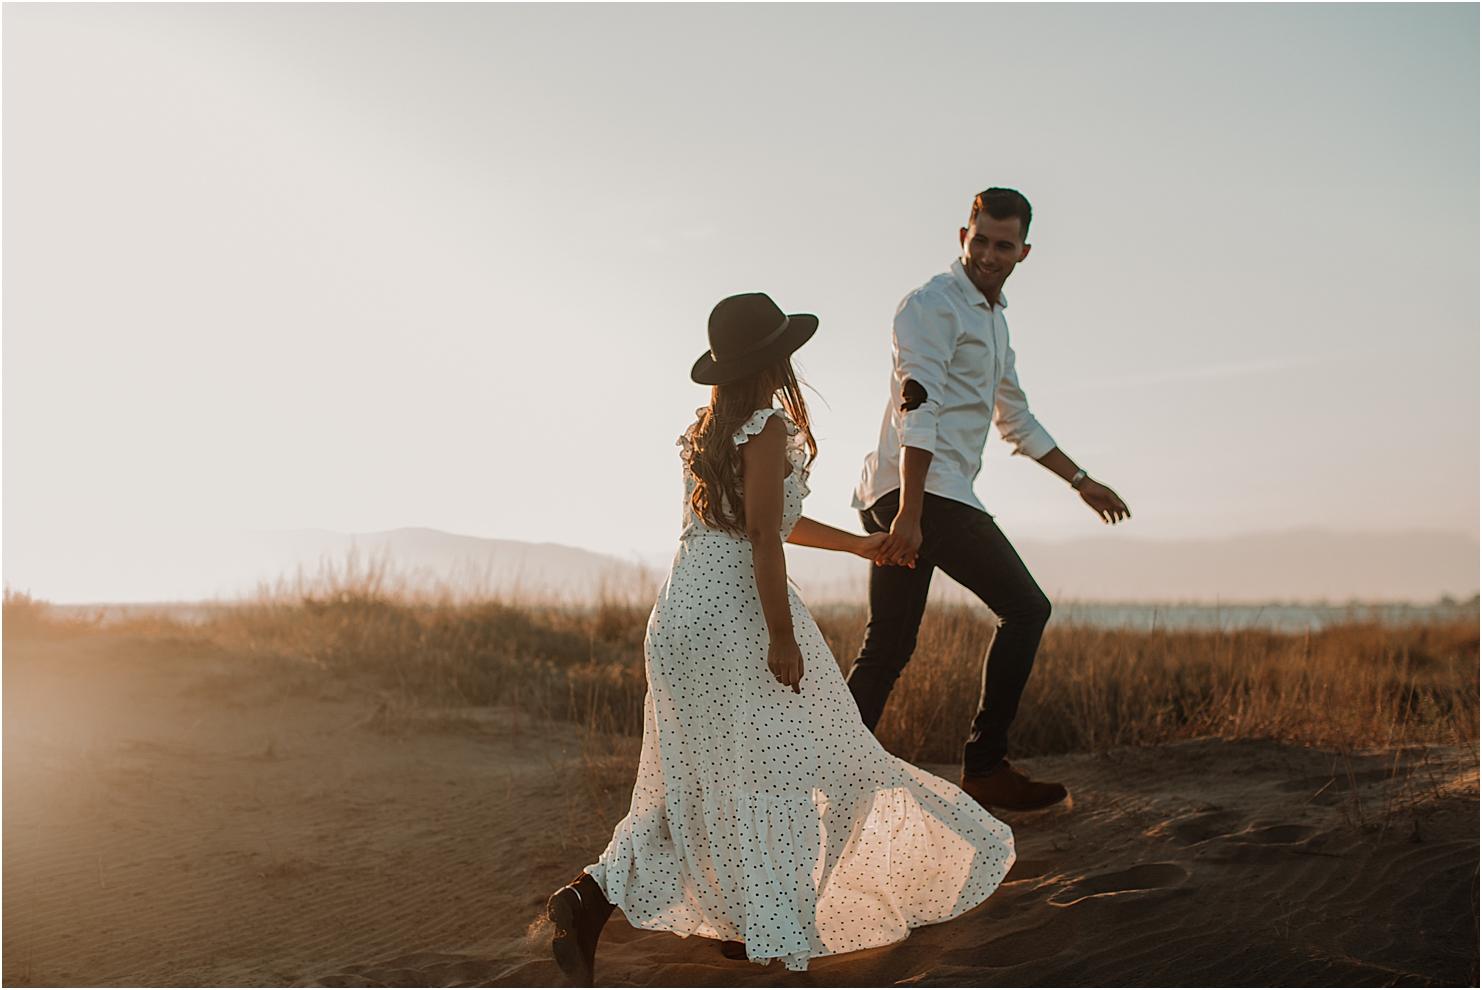 fotografo de boda en tarragona -25.jpg